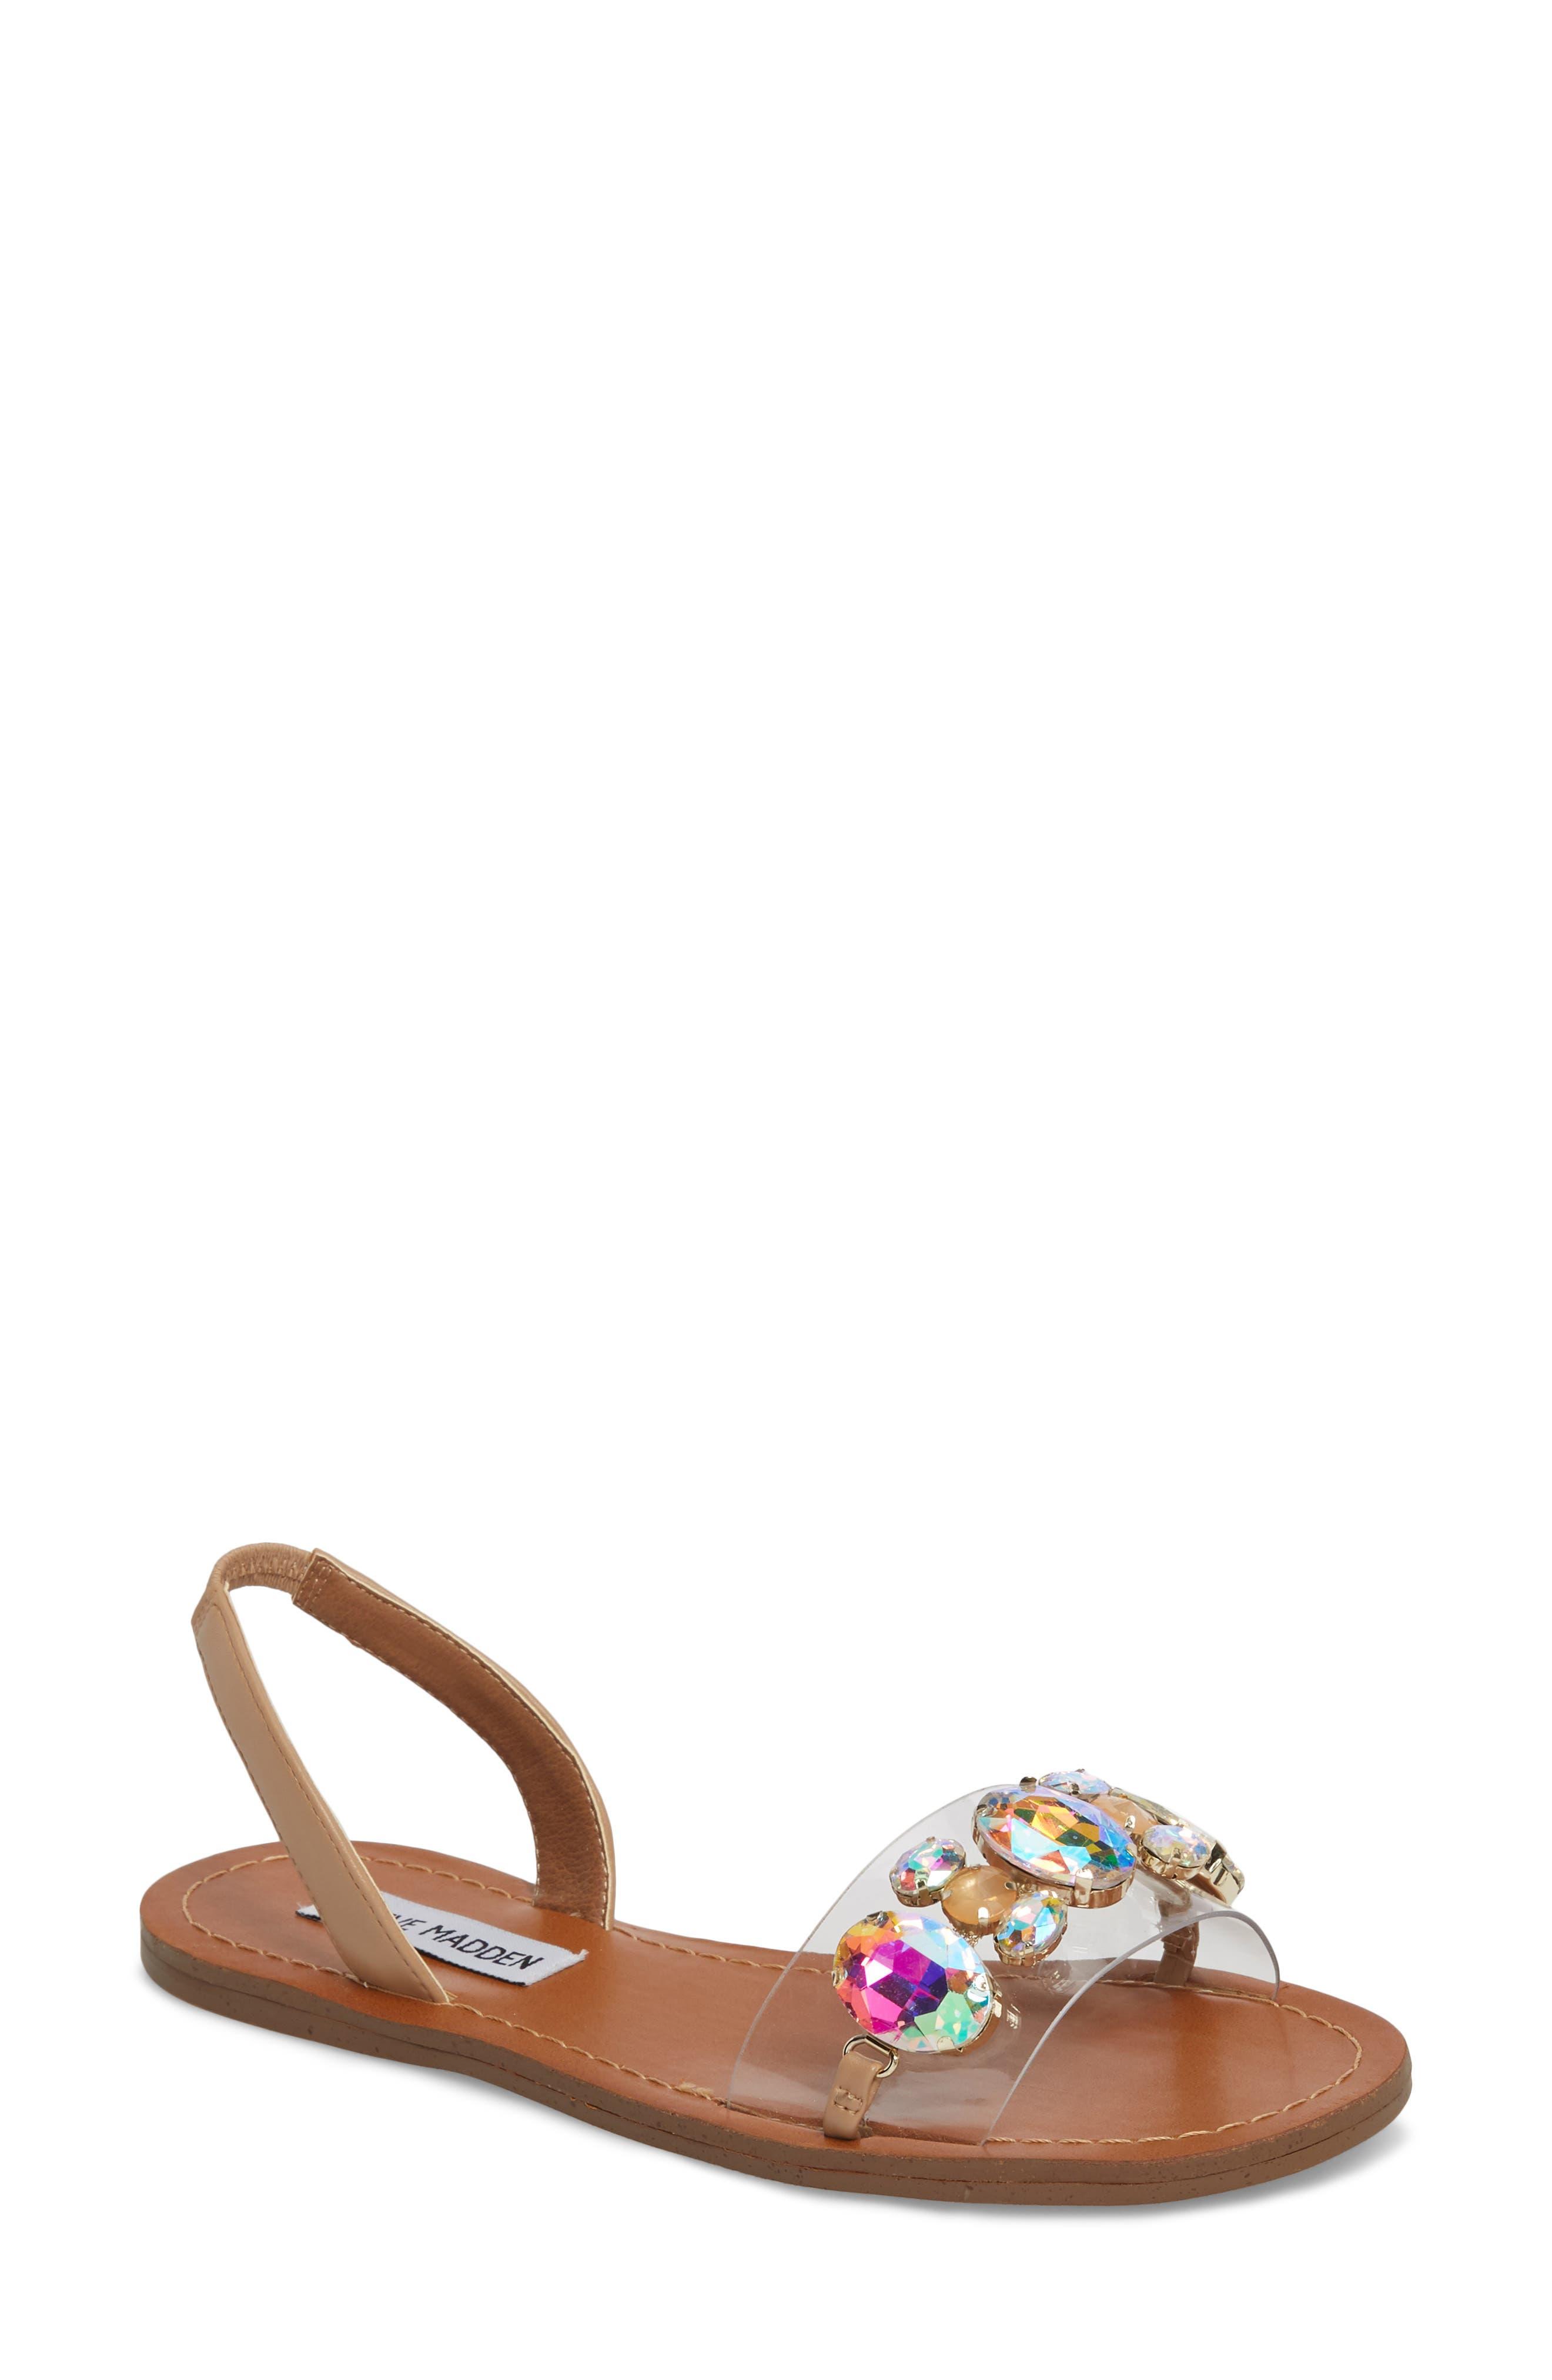 Alice Crystal Embellished Sandal,                             Main thumbnail 1, color,